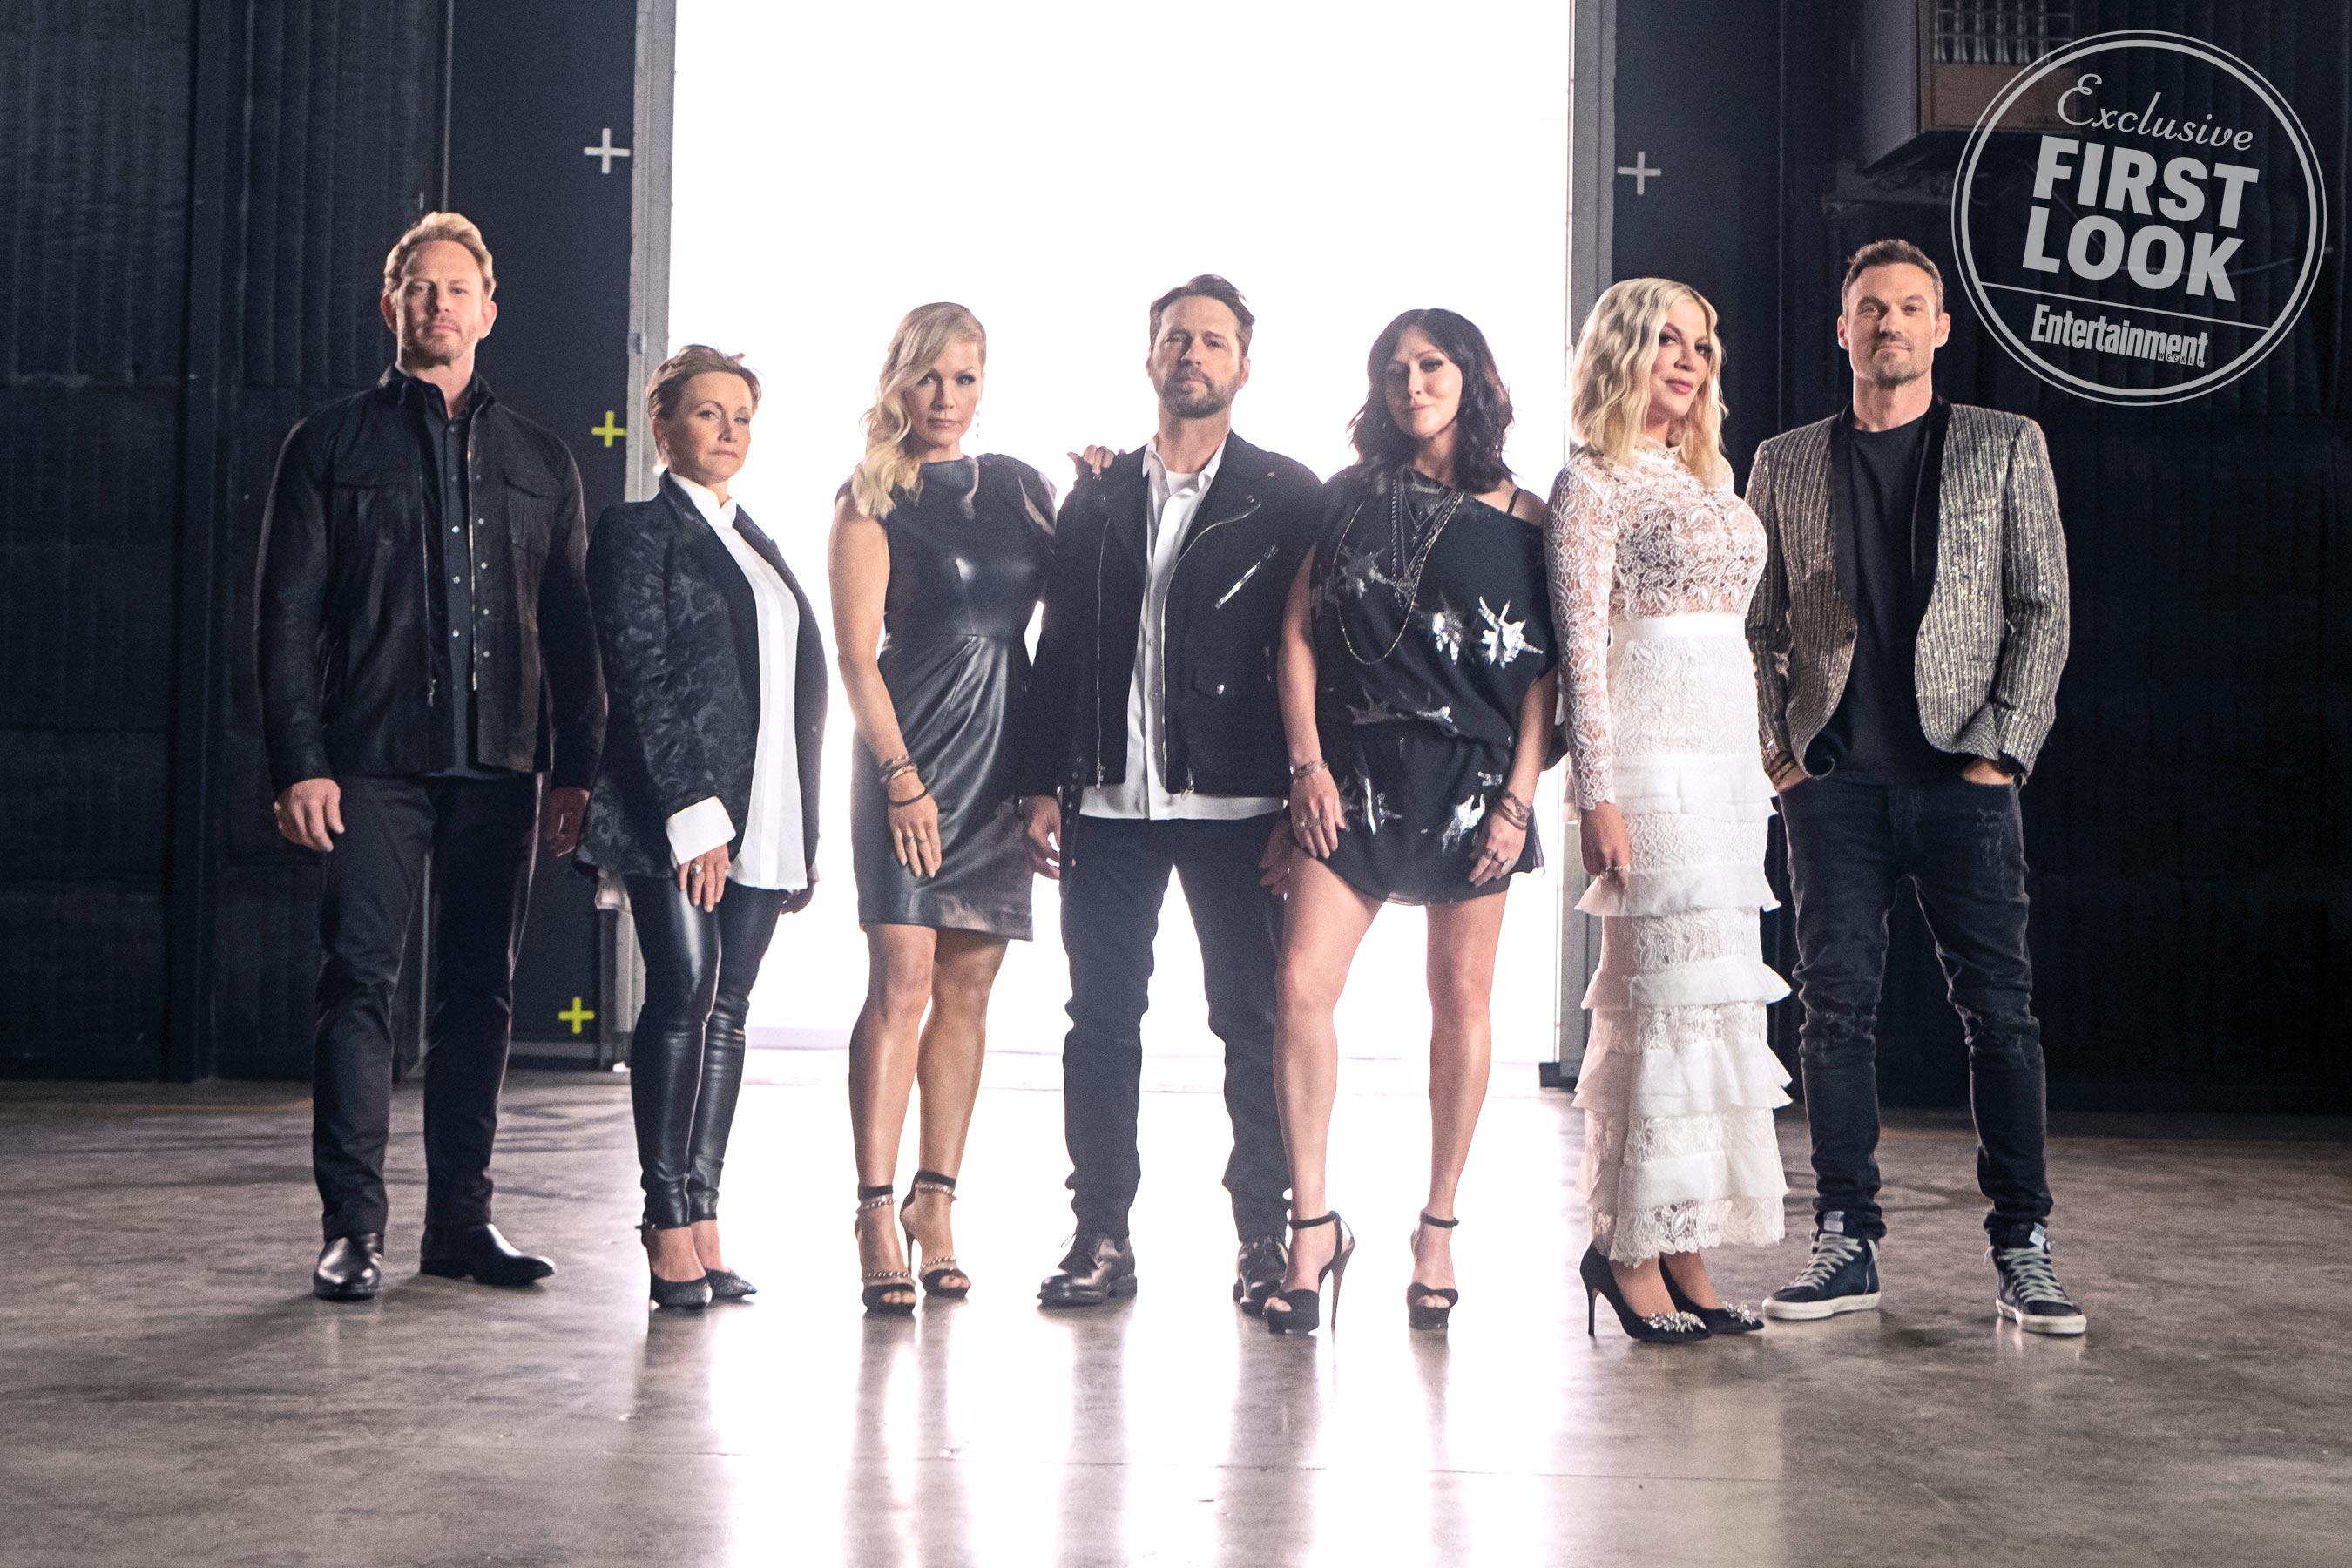 BEVERLY HILLS 90210, LE PRIME FOTO DEL REBOOT